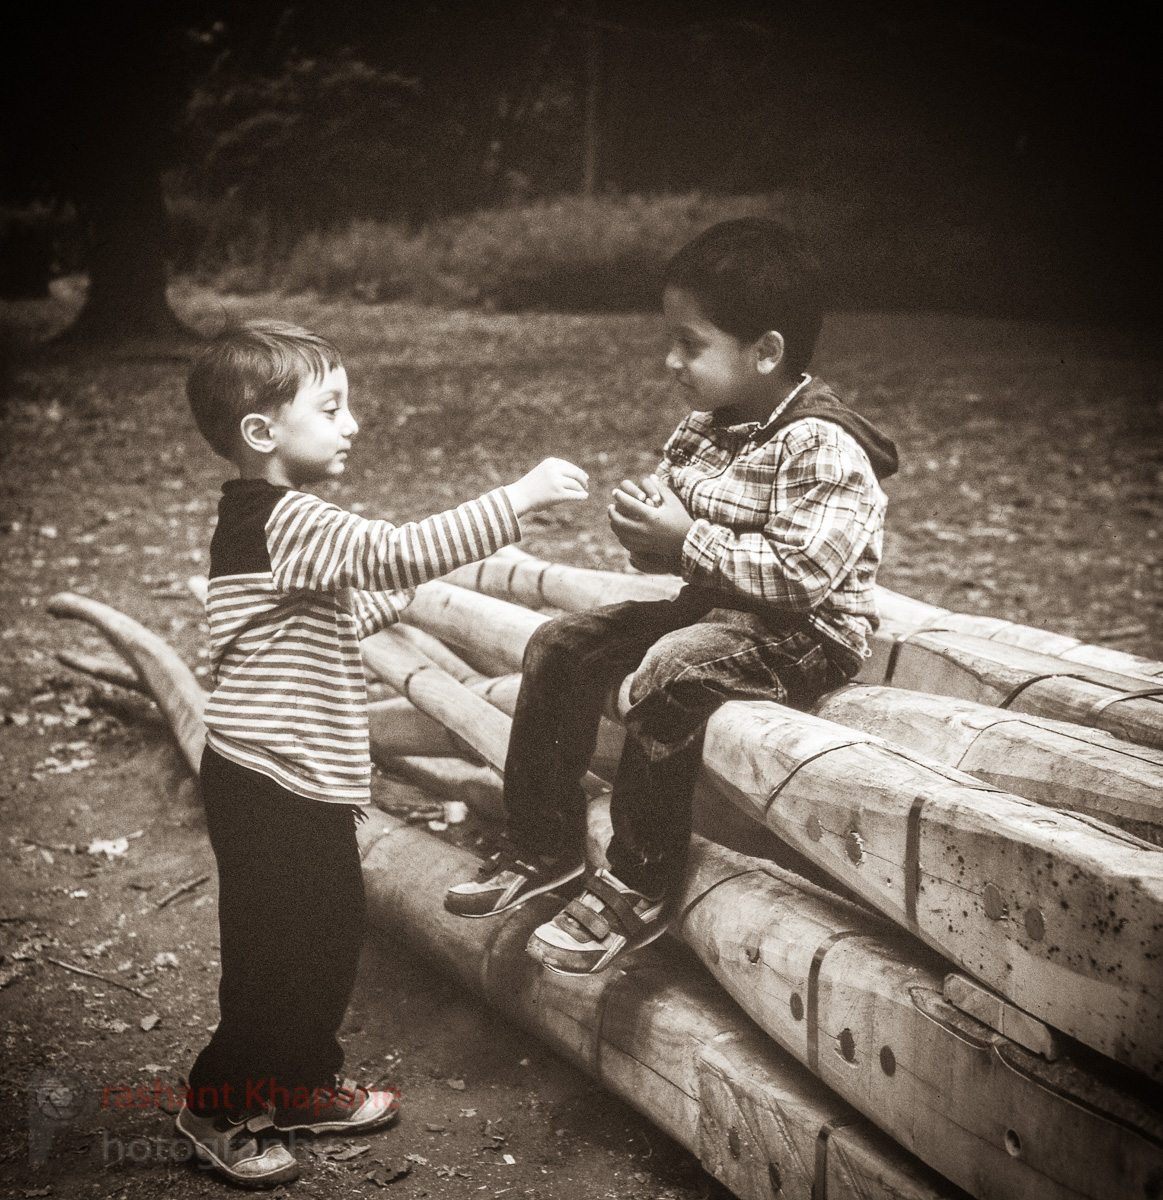 Friendship. Yugandhar & Arnav. 2014.